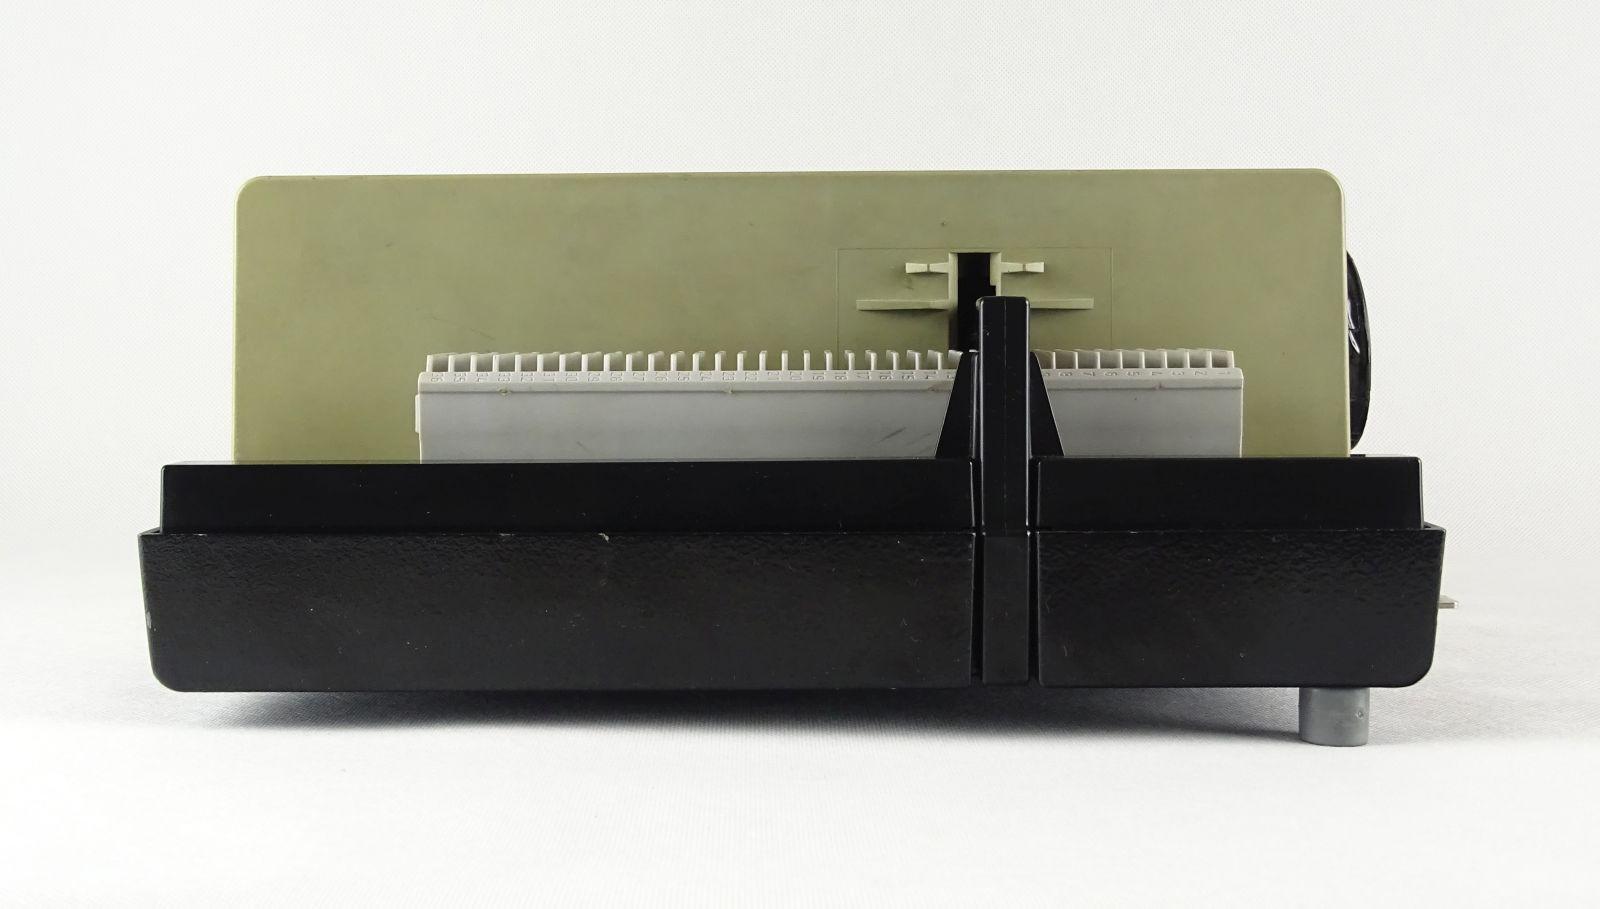 DSC06254.JPG (1600×909)